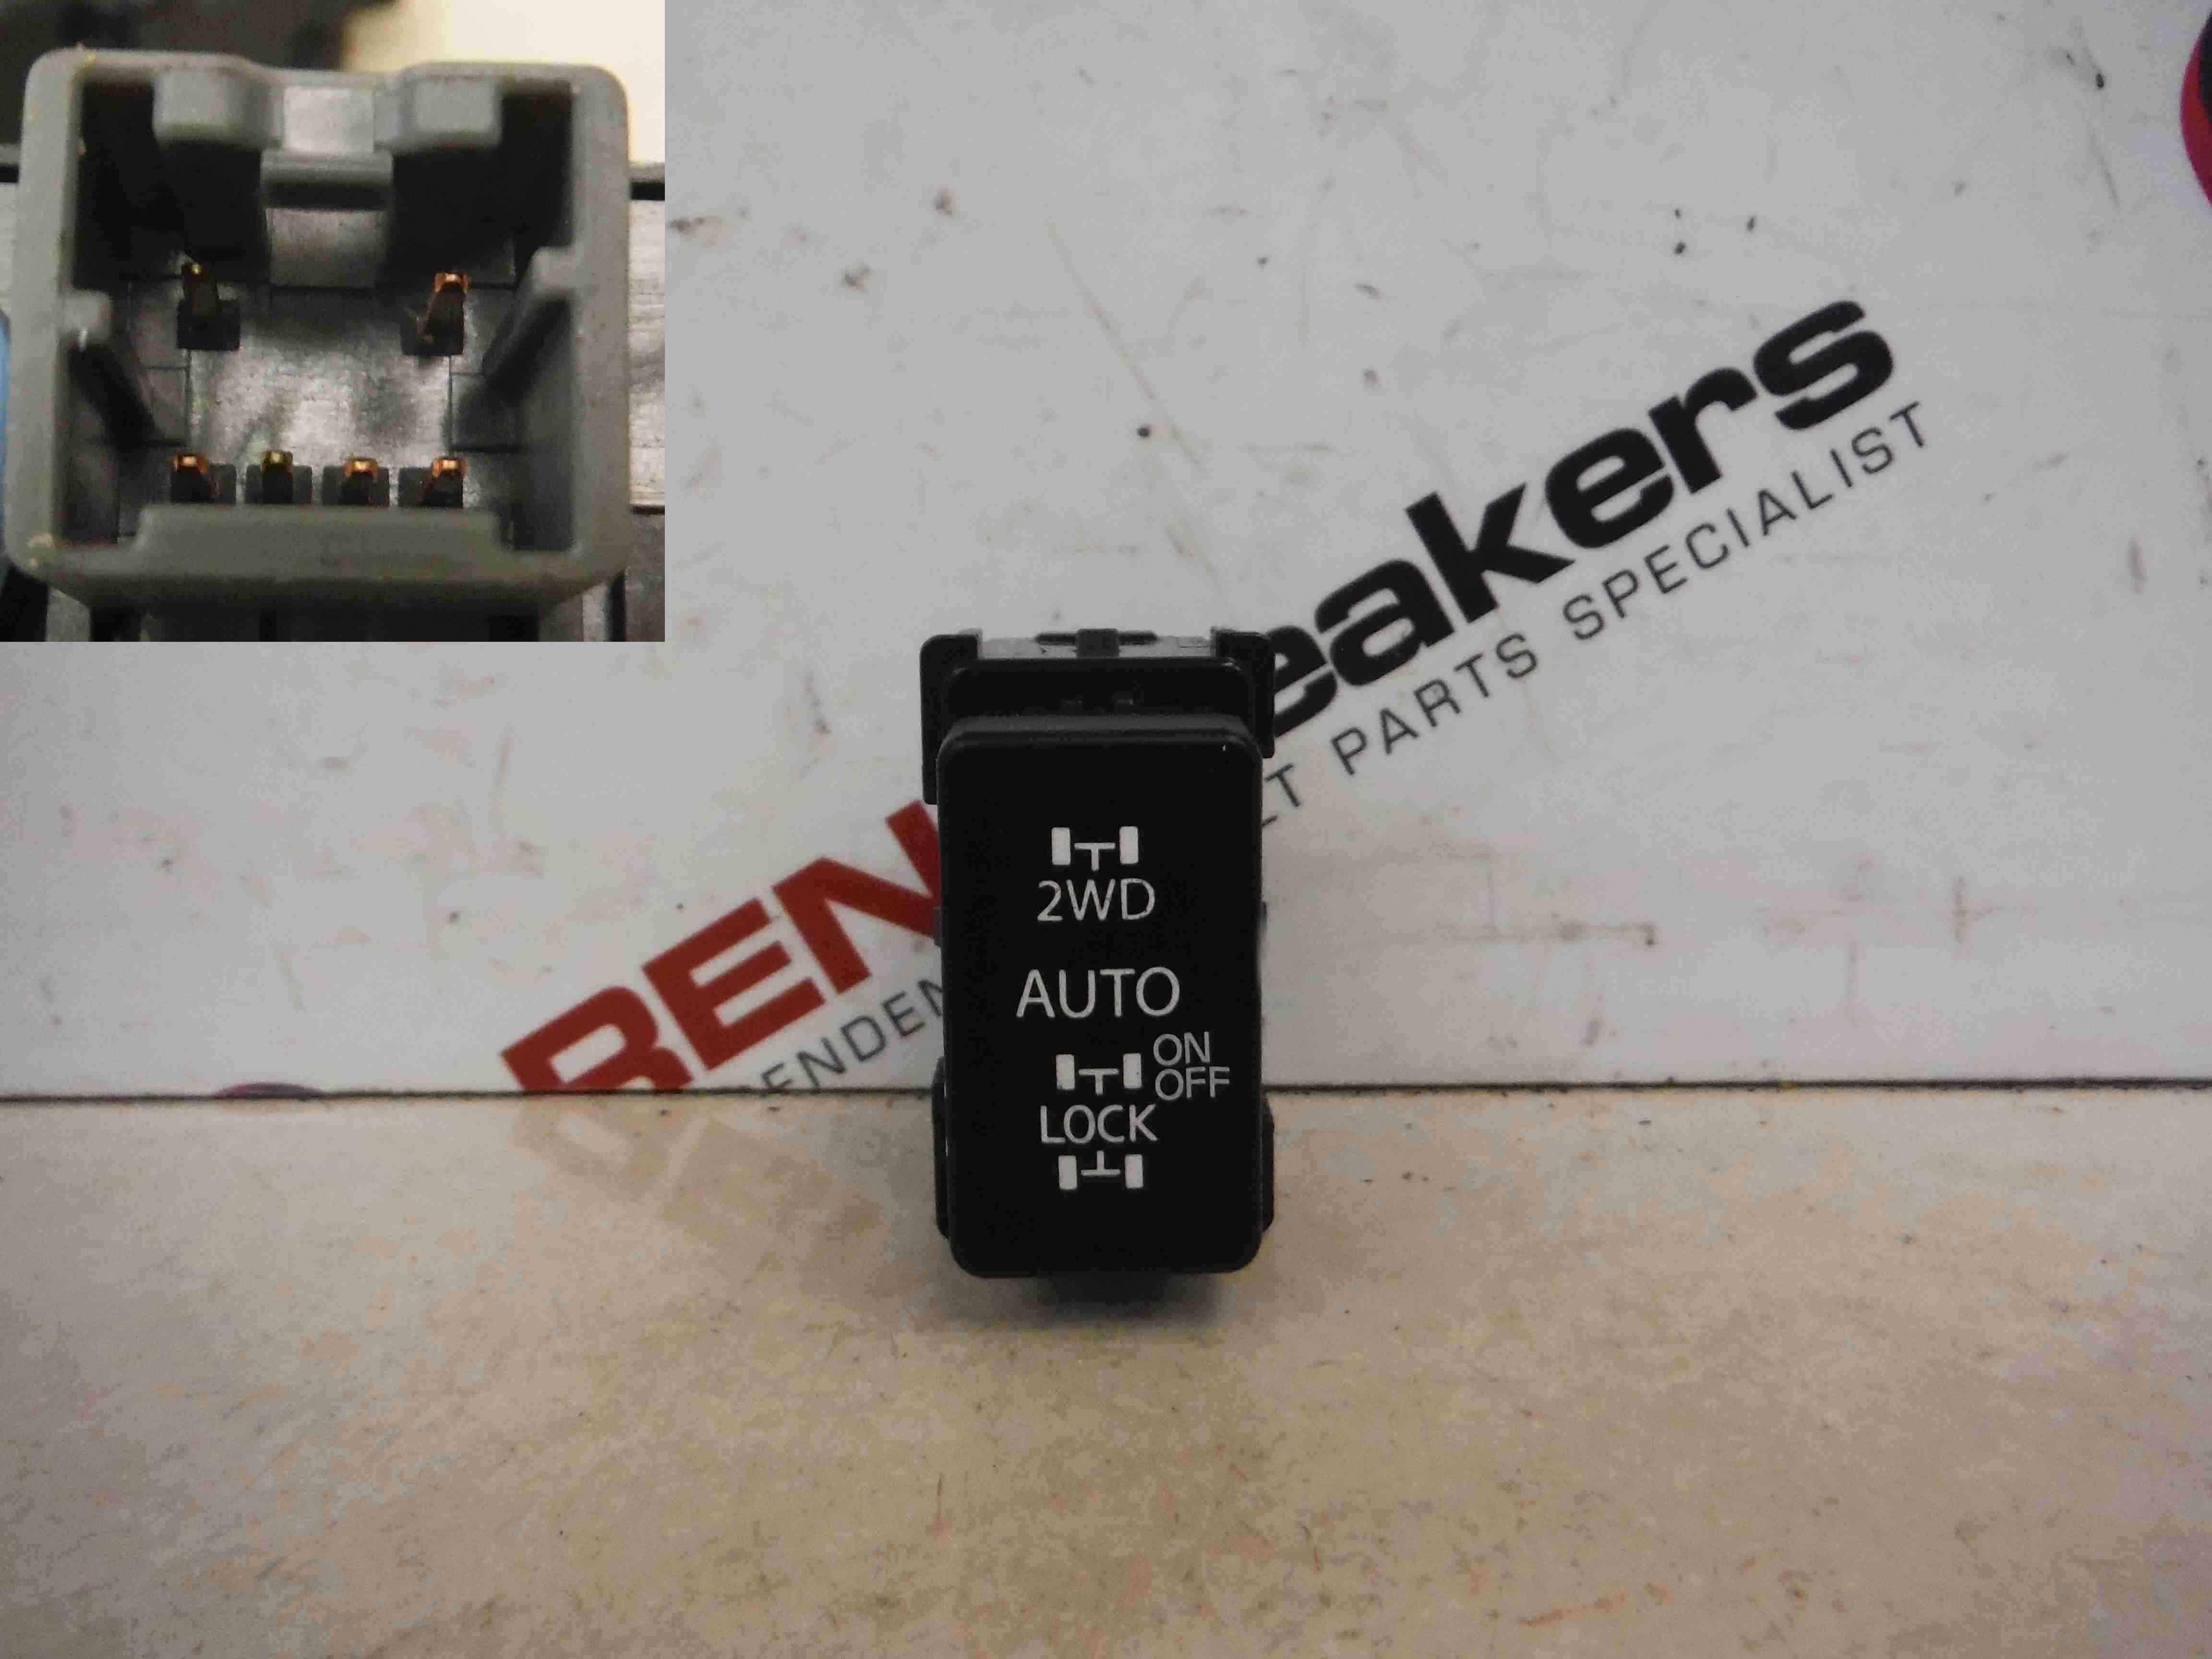 Renault Koleos 2008-2010 4WD 2WD Rear Differential Lock Gearbox 4 Wheel Drive